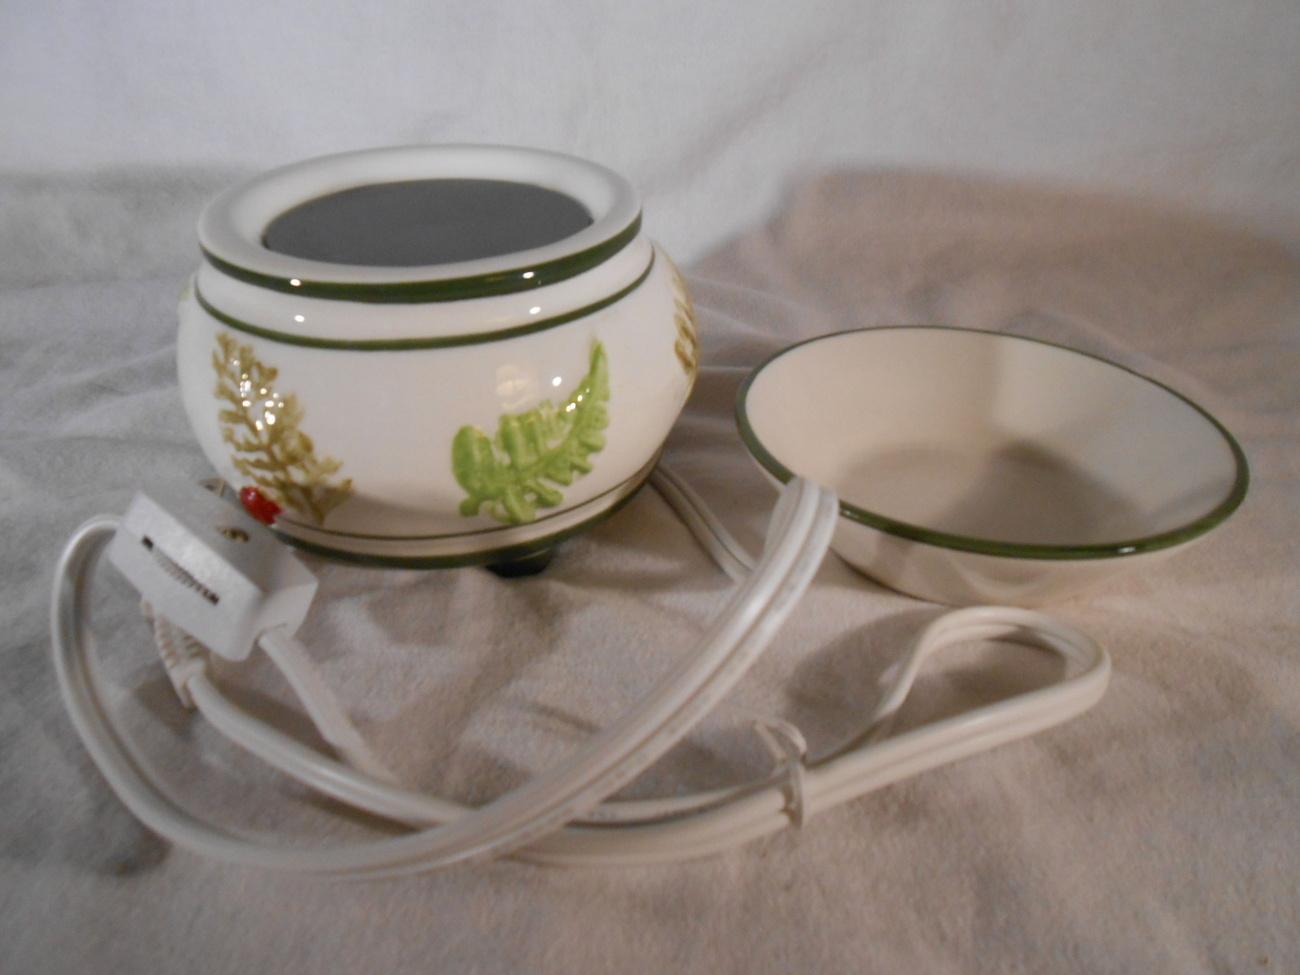 Designer CANDLE WARMER Tart Melt Oil SCENT SIMMER Ceramic Mia Bellas Candles